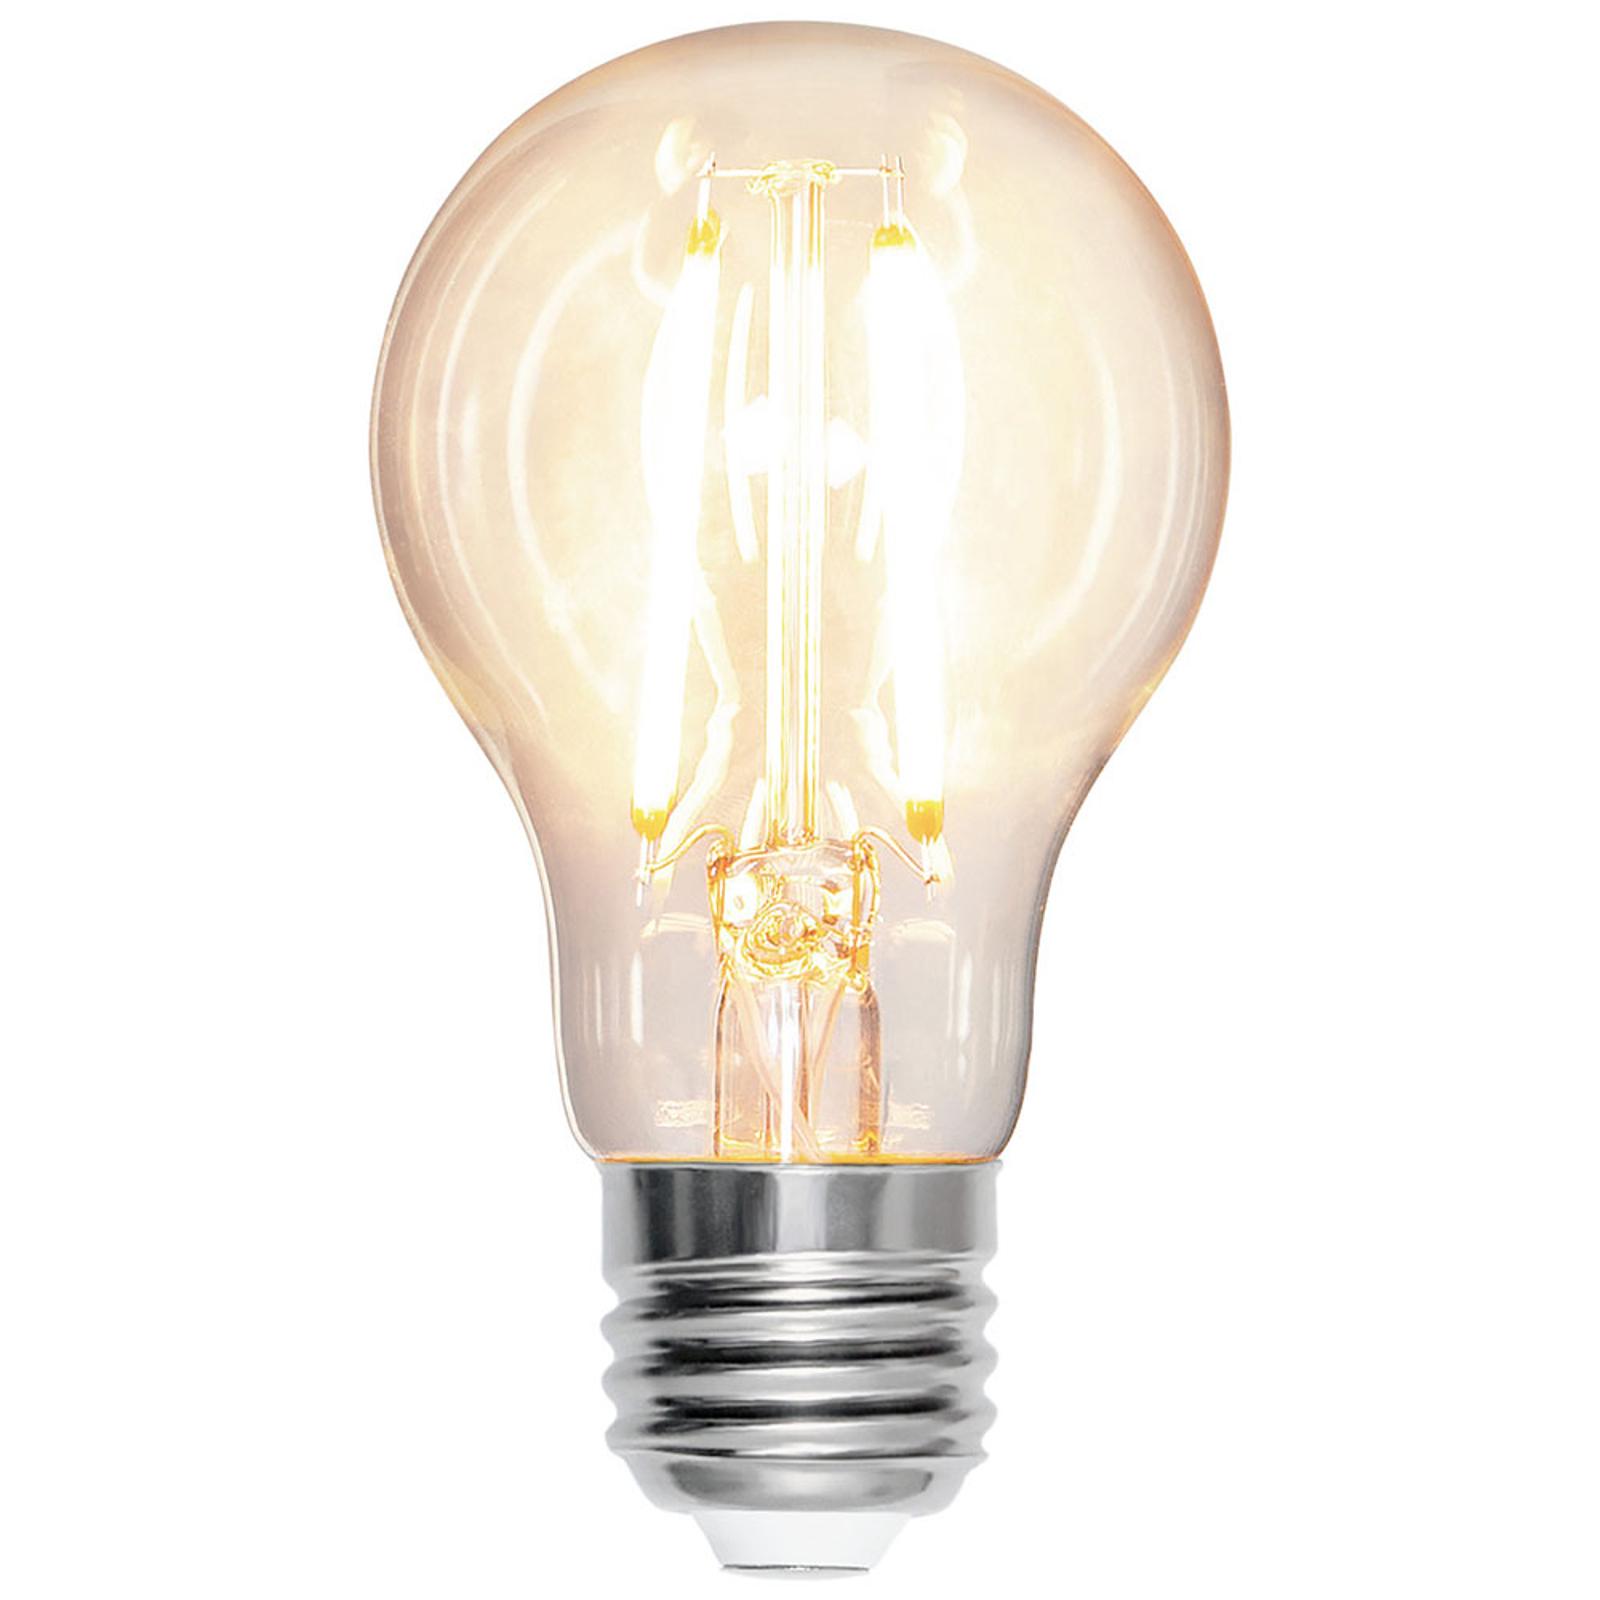 LED bulb E27 A60 7 W 2,700 K filament 810 lm_1523882_1